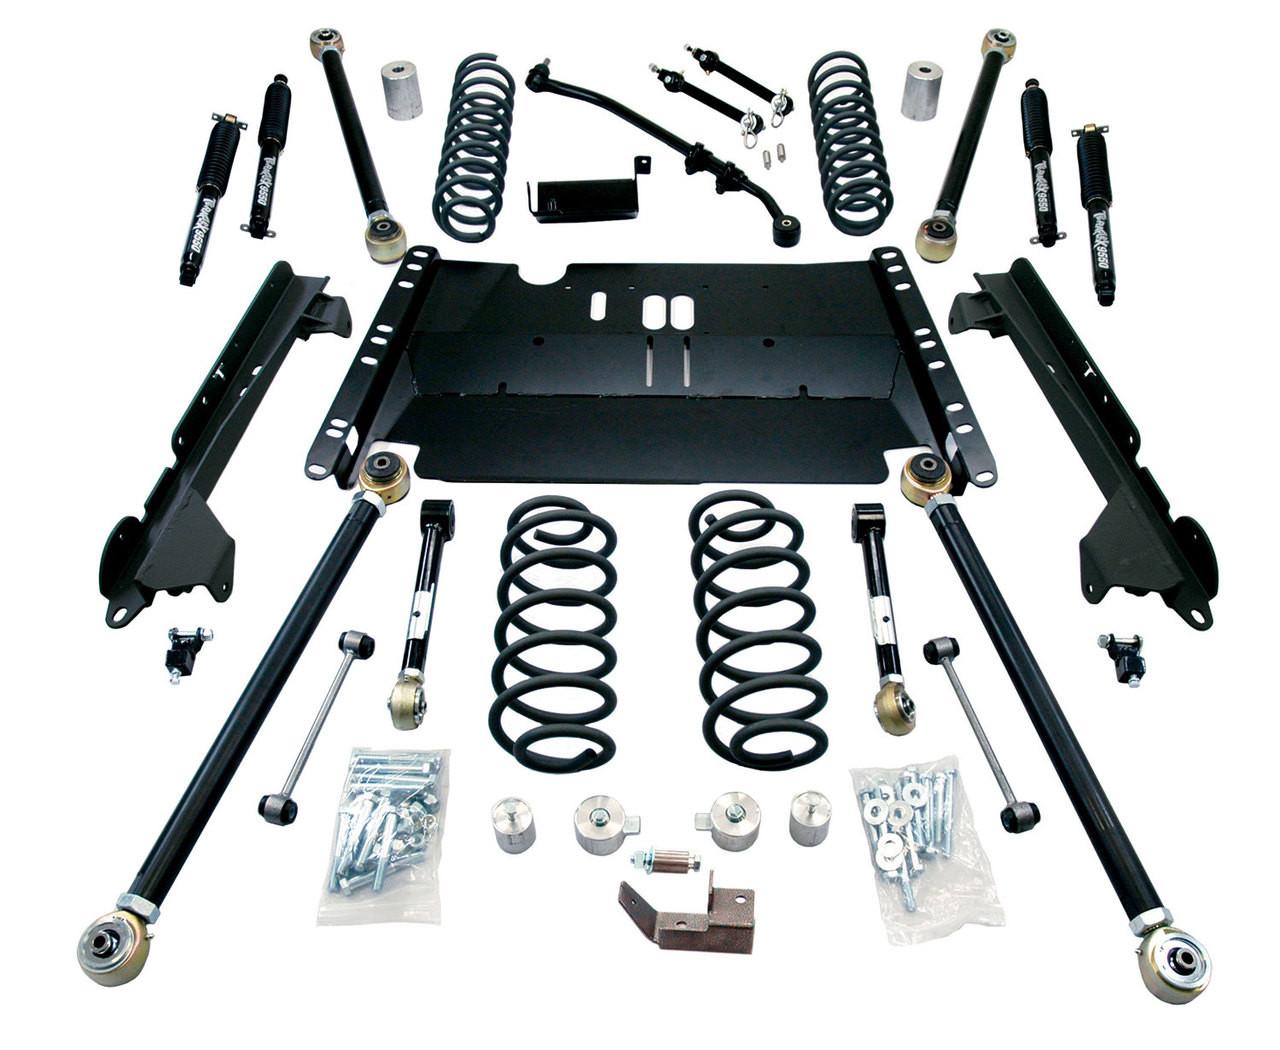 "TeraFlex 1249372 3"" Enduro LCG Lift Kit with Shocks for Jeep Wrangler TJ 1997-2006"